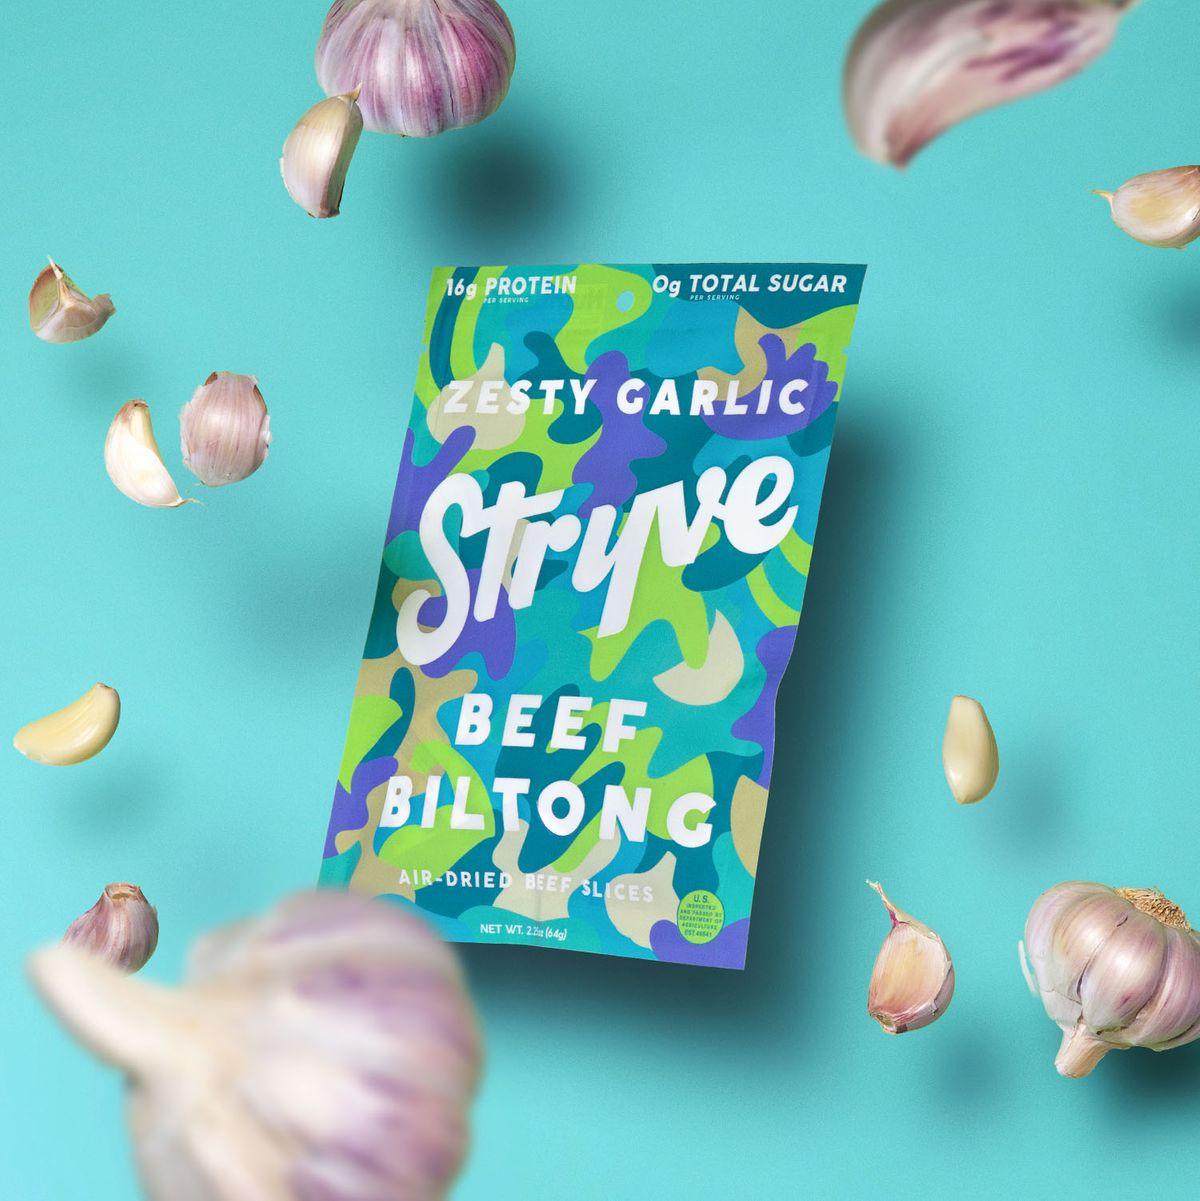 Stryve-Garlic-72DPI.jpg